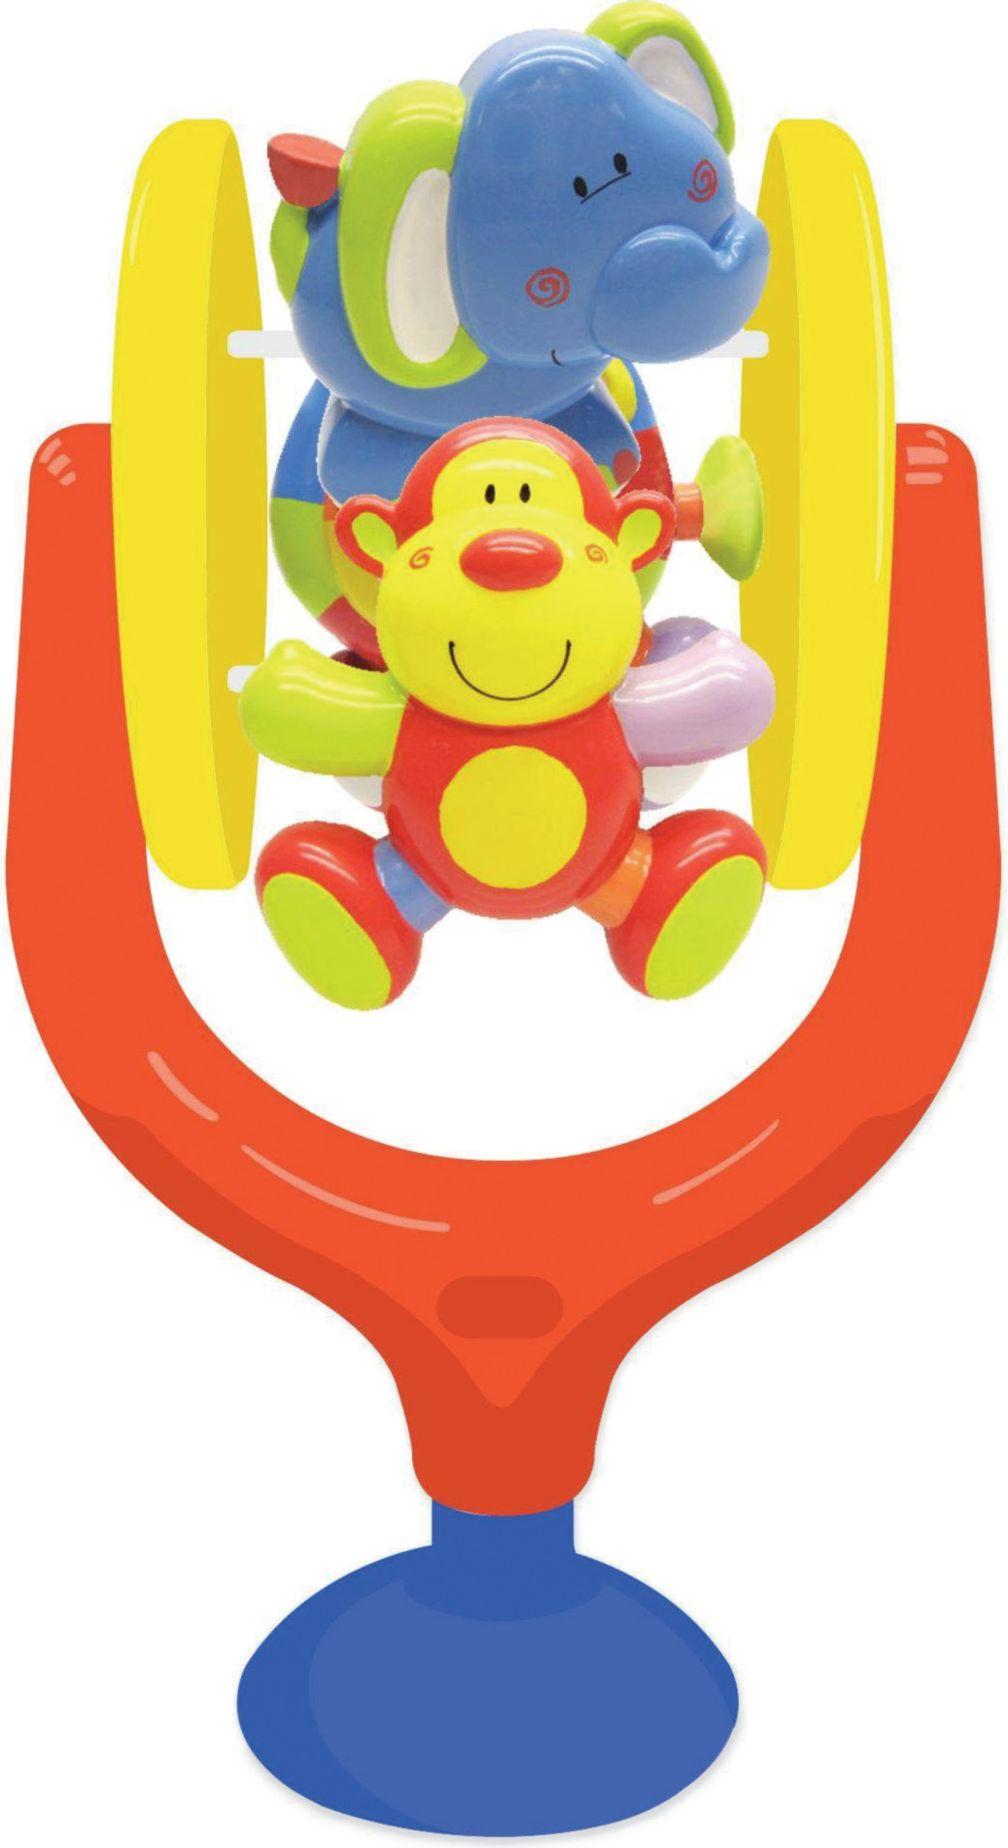 Juaimurah Mothercare Animal Spinning High Chair Toy